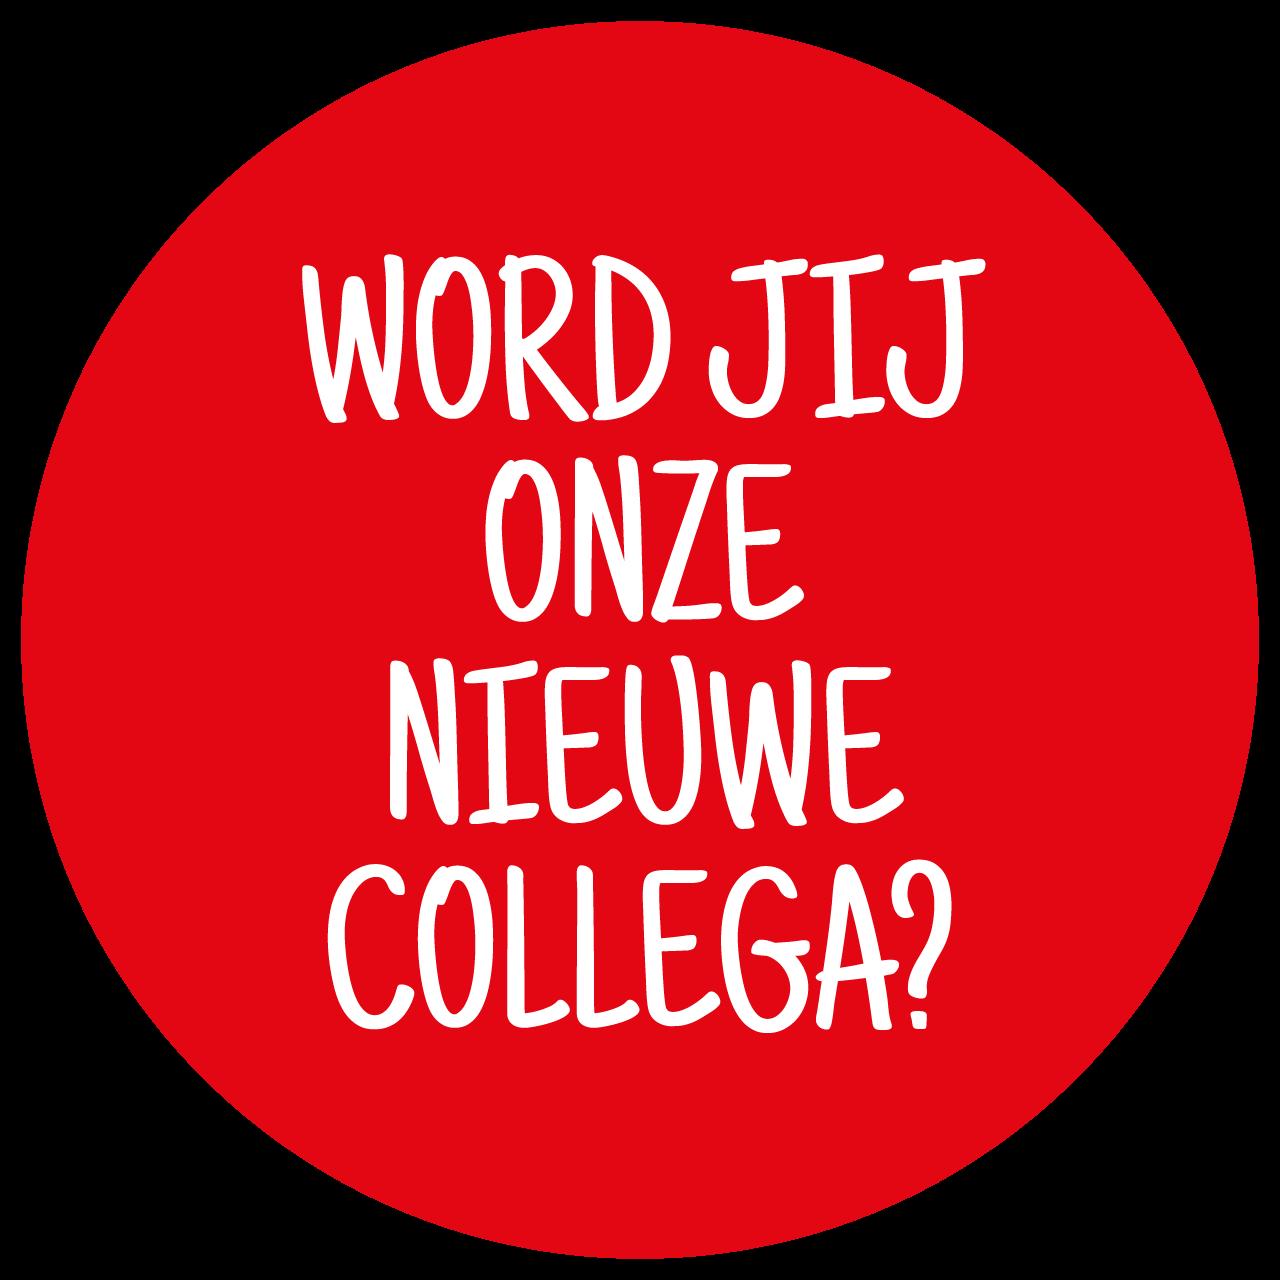 WORD-JIJ